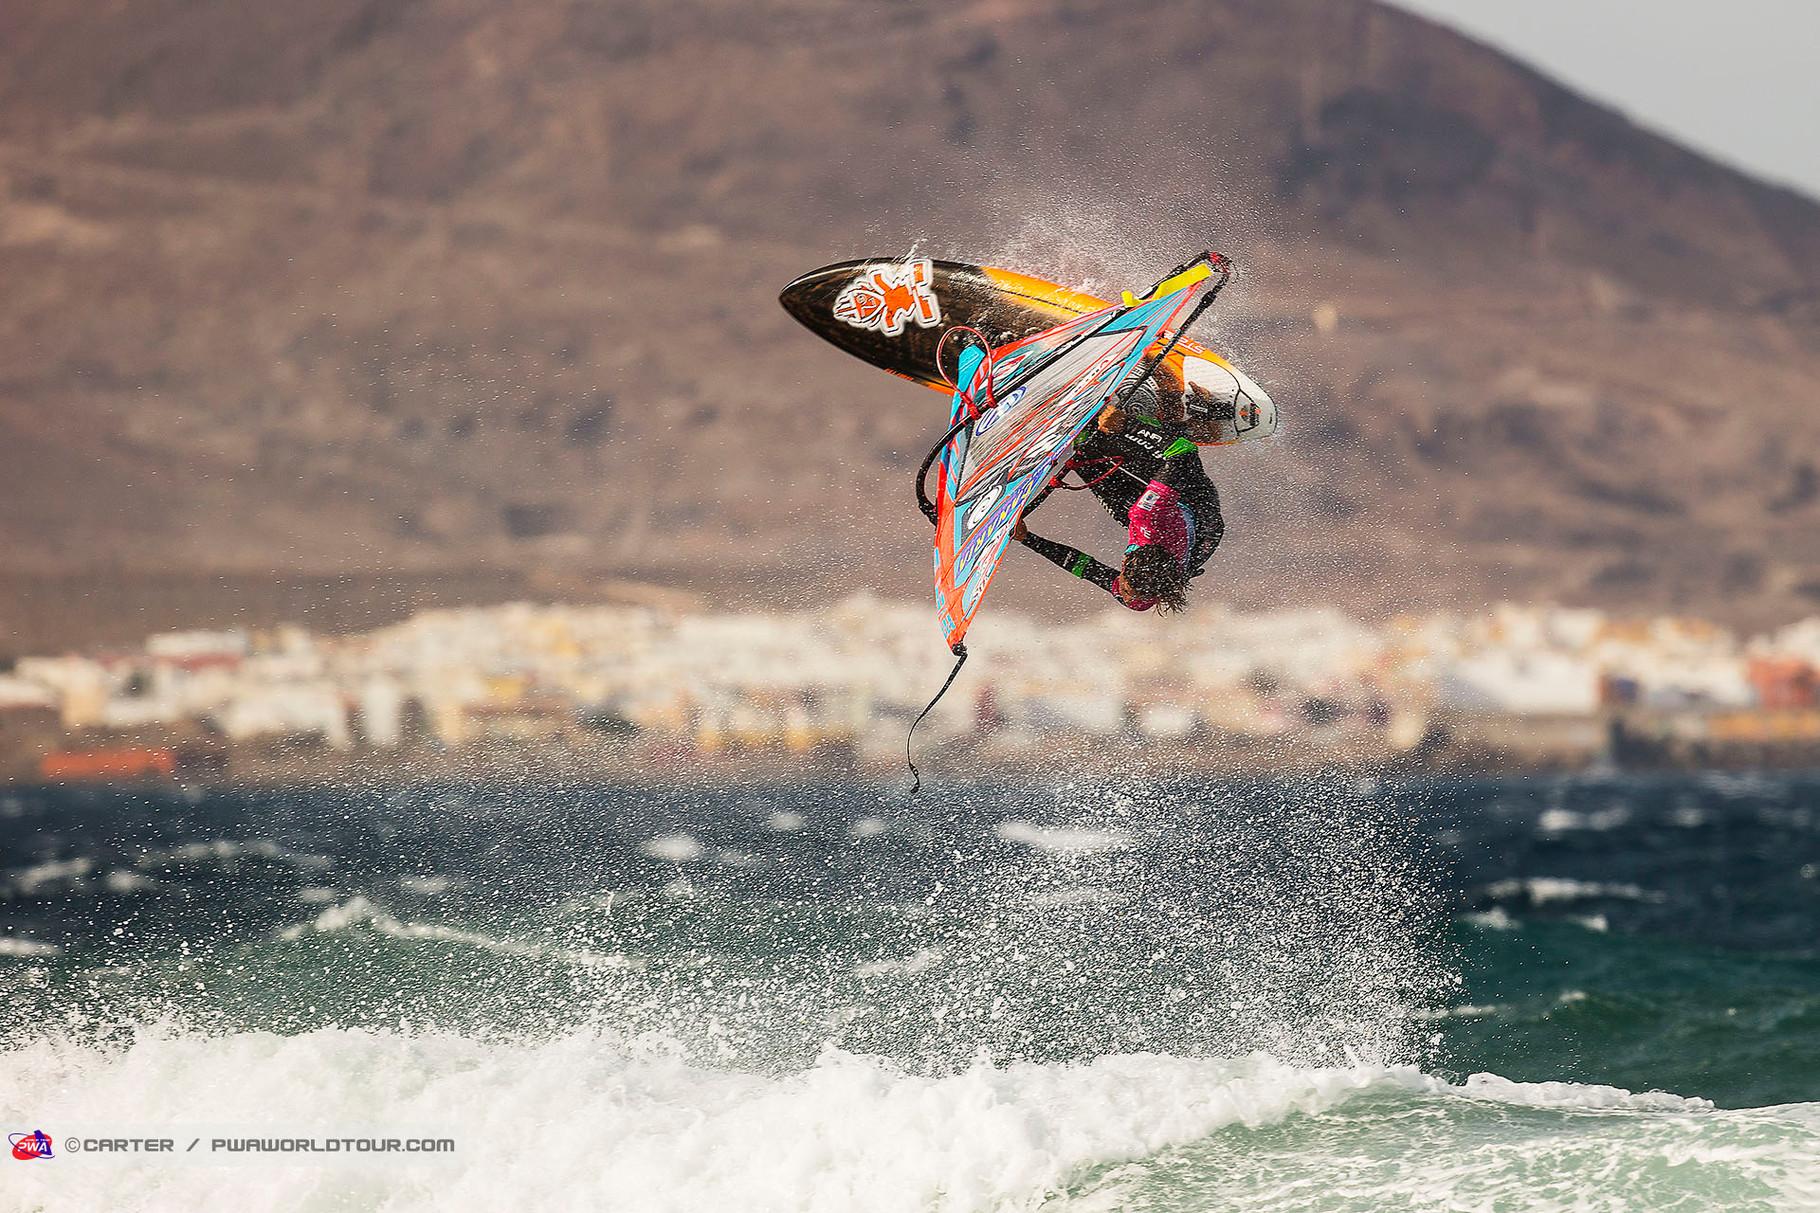 Iballa Ruano Moreno Backloop. ©Carter PWA